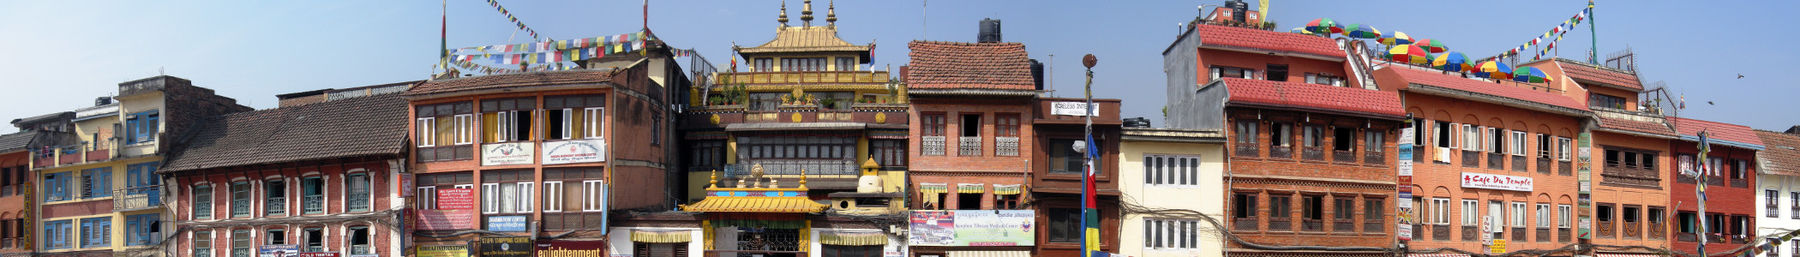 kathmandu chat Opposite vishal bazar, shukra patha, new road kathmandu phone:  of desi  choice specially dosa's, cholley bhature, punjabi paranth's, royal chat dishes.